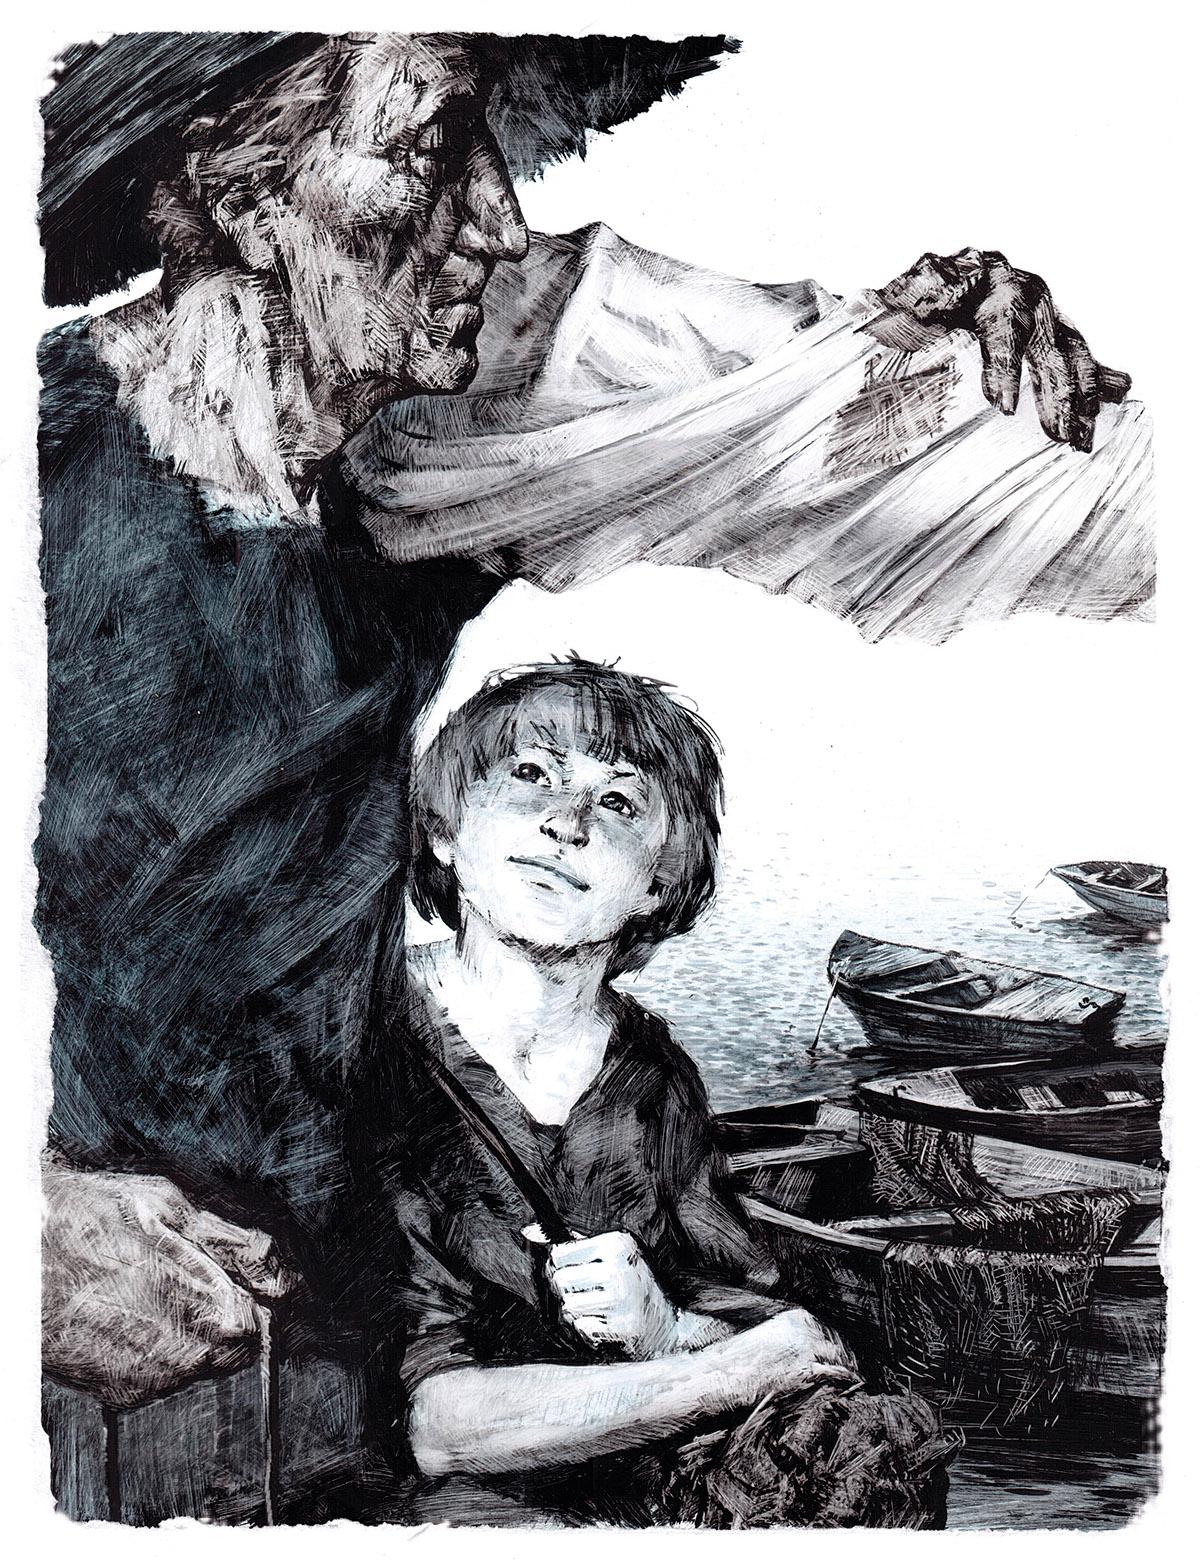 illustrations oil graphic arts book illustration